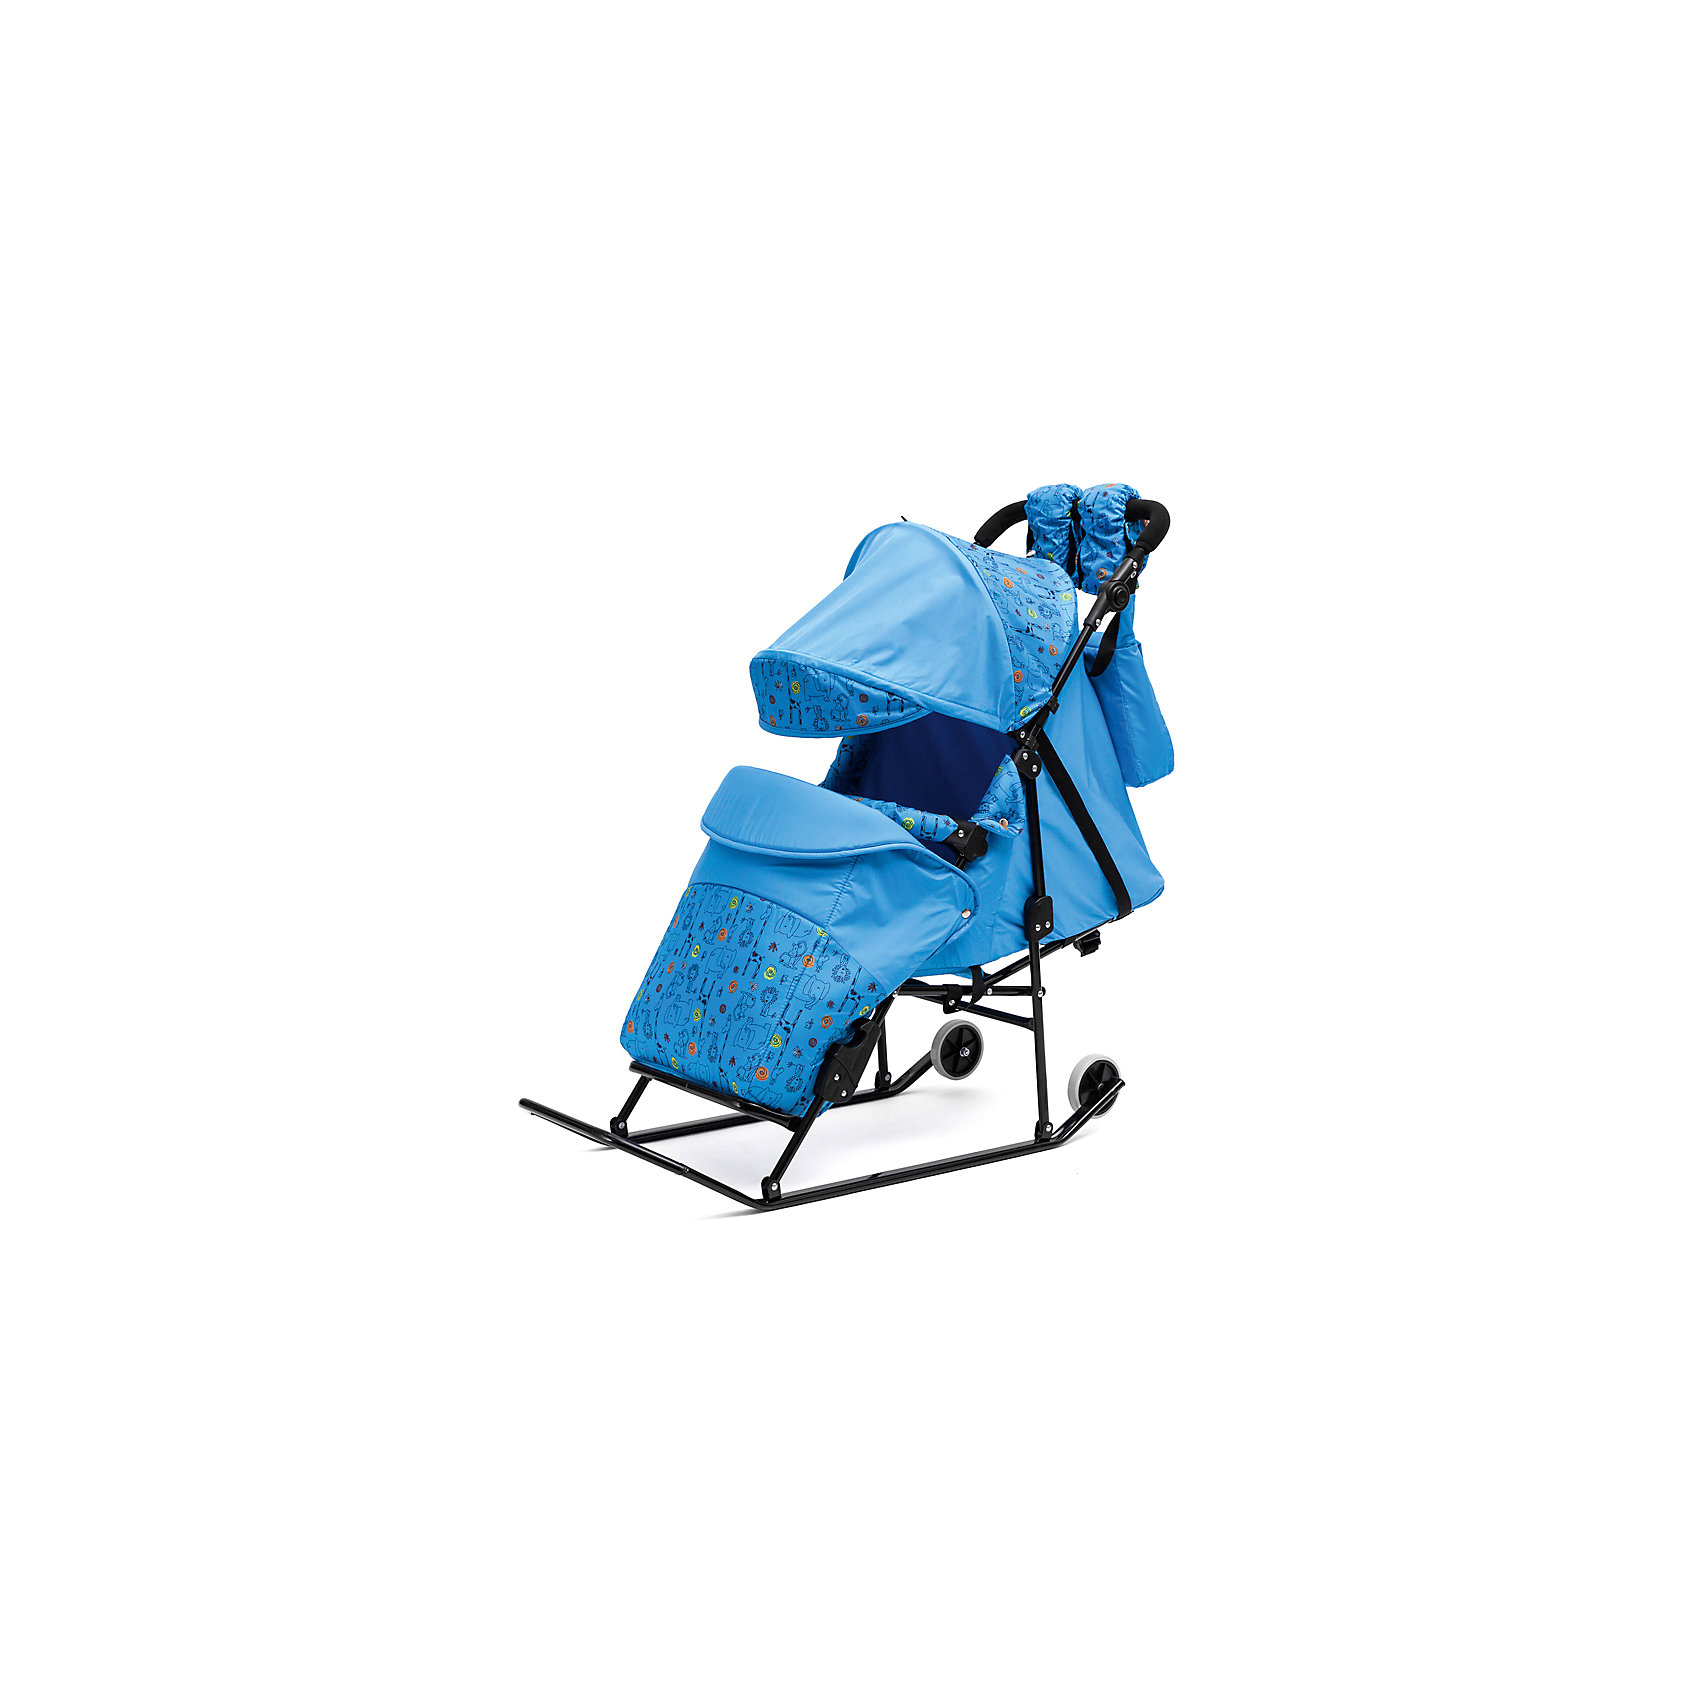 ABC Academy Санки-коляска Зимняя сказка 3В Авто, черная рама, ABC Academy, голубой/зоопарк ba904 academy wwii german artwox battleship bismarck wood deck aw10047